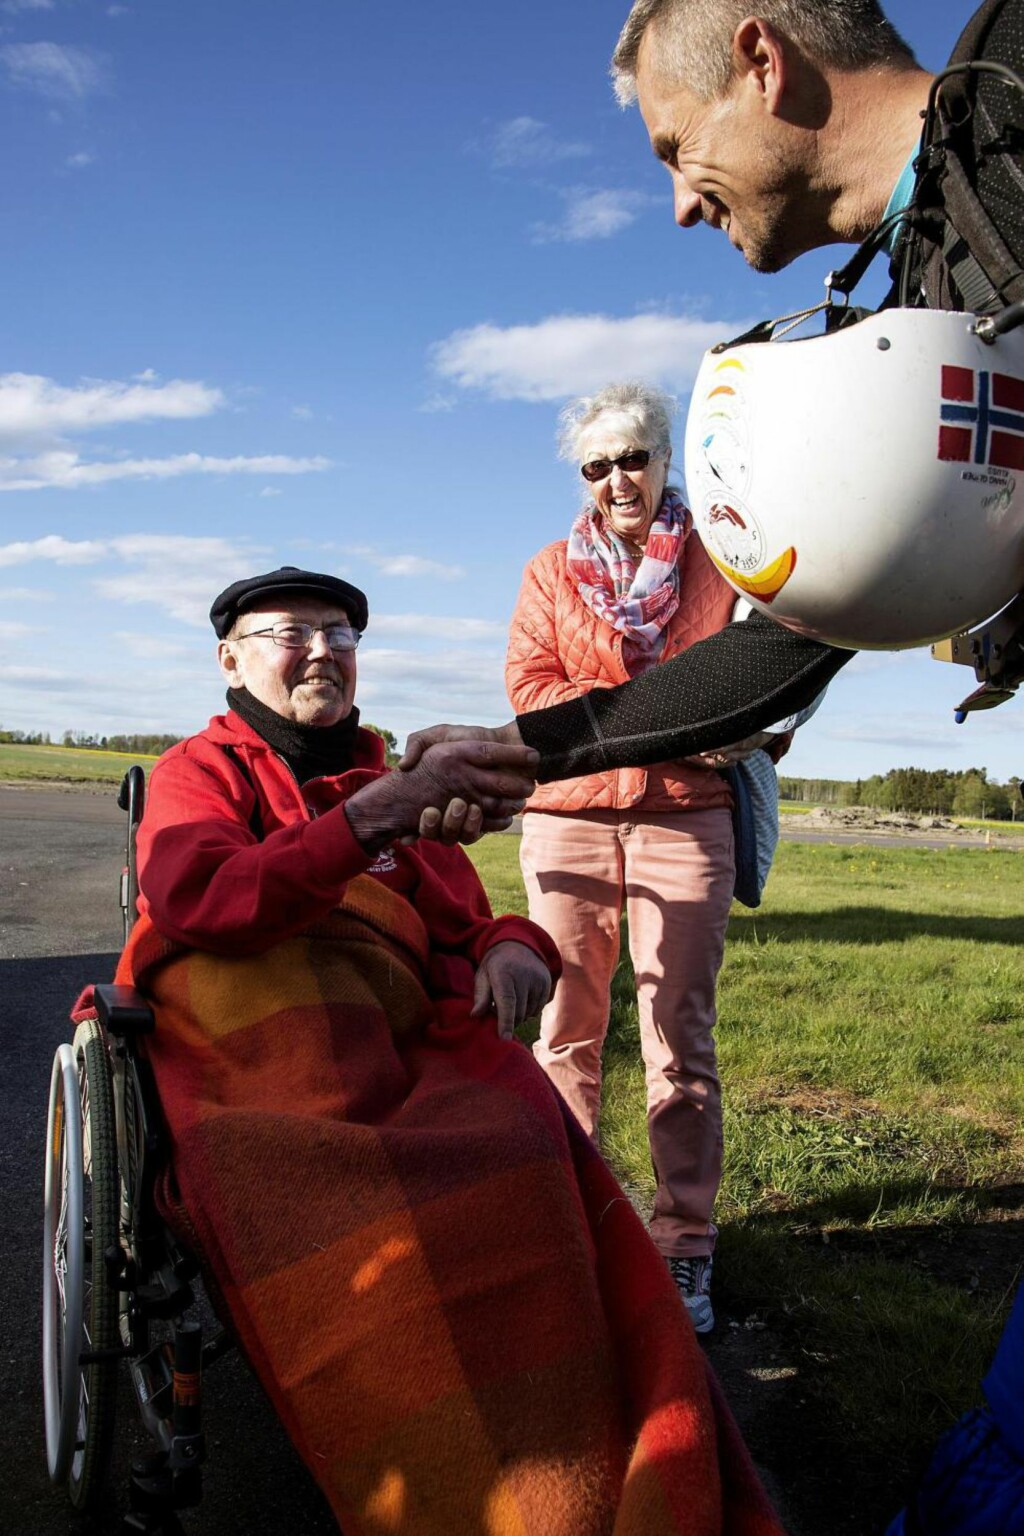 BAKKEKONTAKT: En spent Jan Tjemsland og kona Laila Tjemsland hilser på tandempilot Reidar Berntsen som skal ta med 77-åringen på hans første hangglidertur. Foto: LARS MYHREN HOLAND